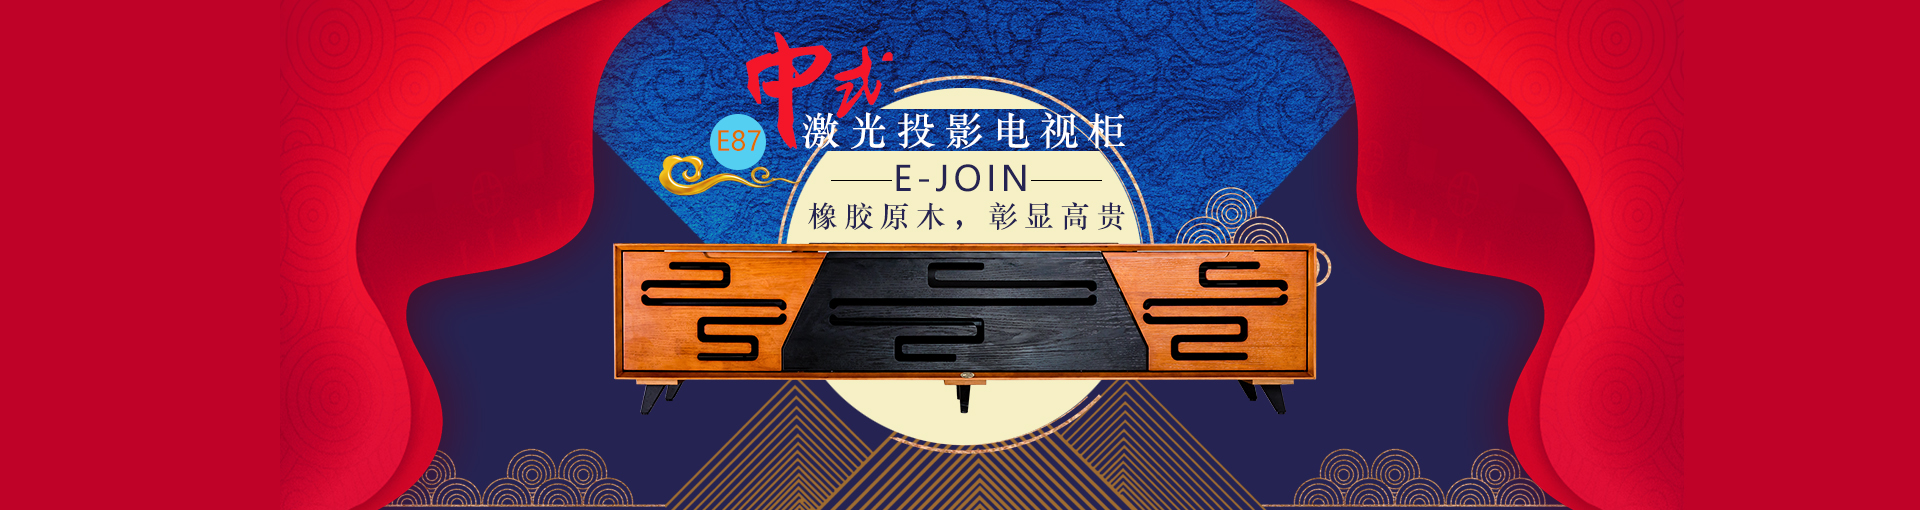 E-JOIN猛犸机柜激光电视电视柜中式客厅家庭影院影音设备柜子橡胶木定制海信激光电视柜E87中国风 香槟金